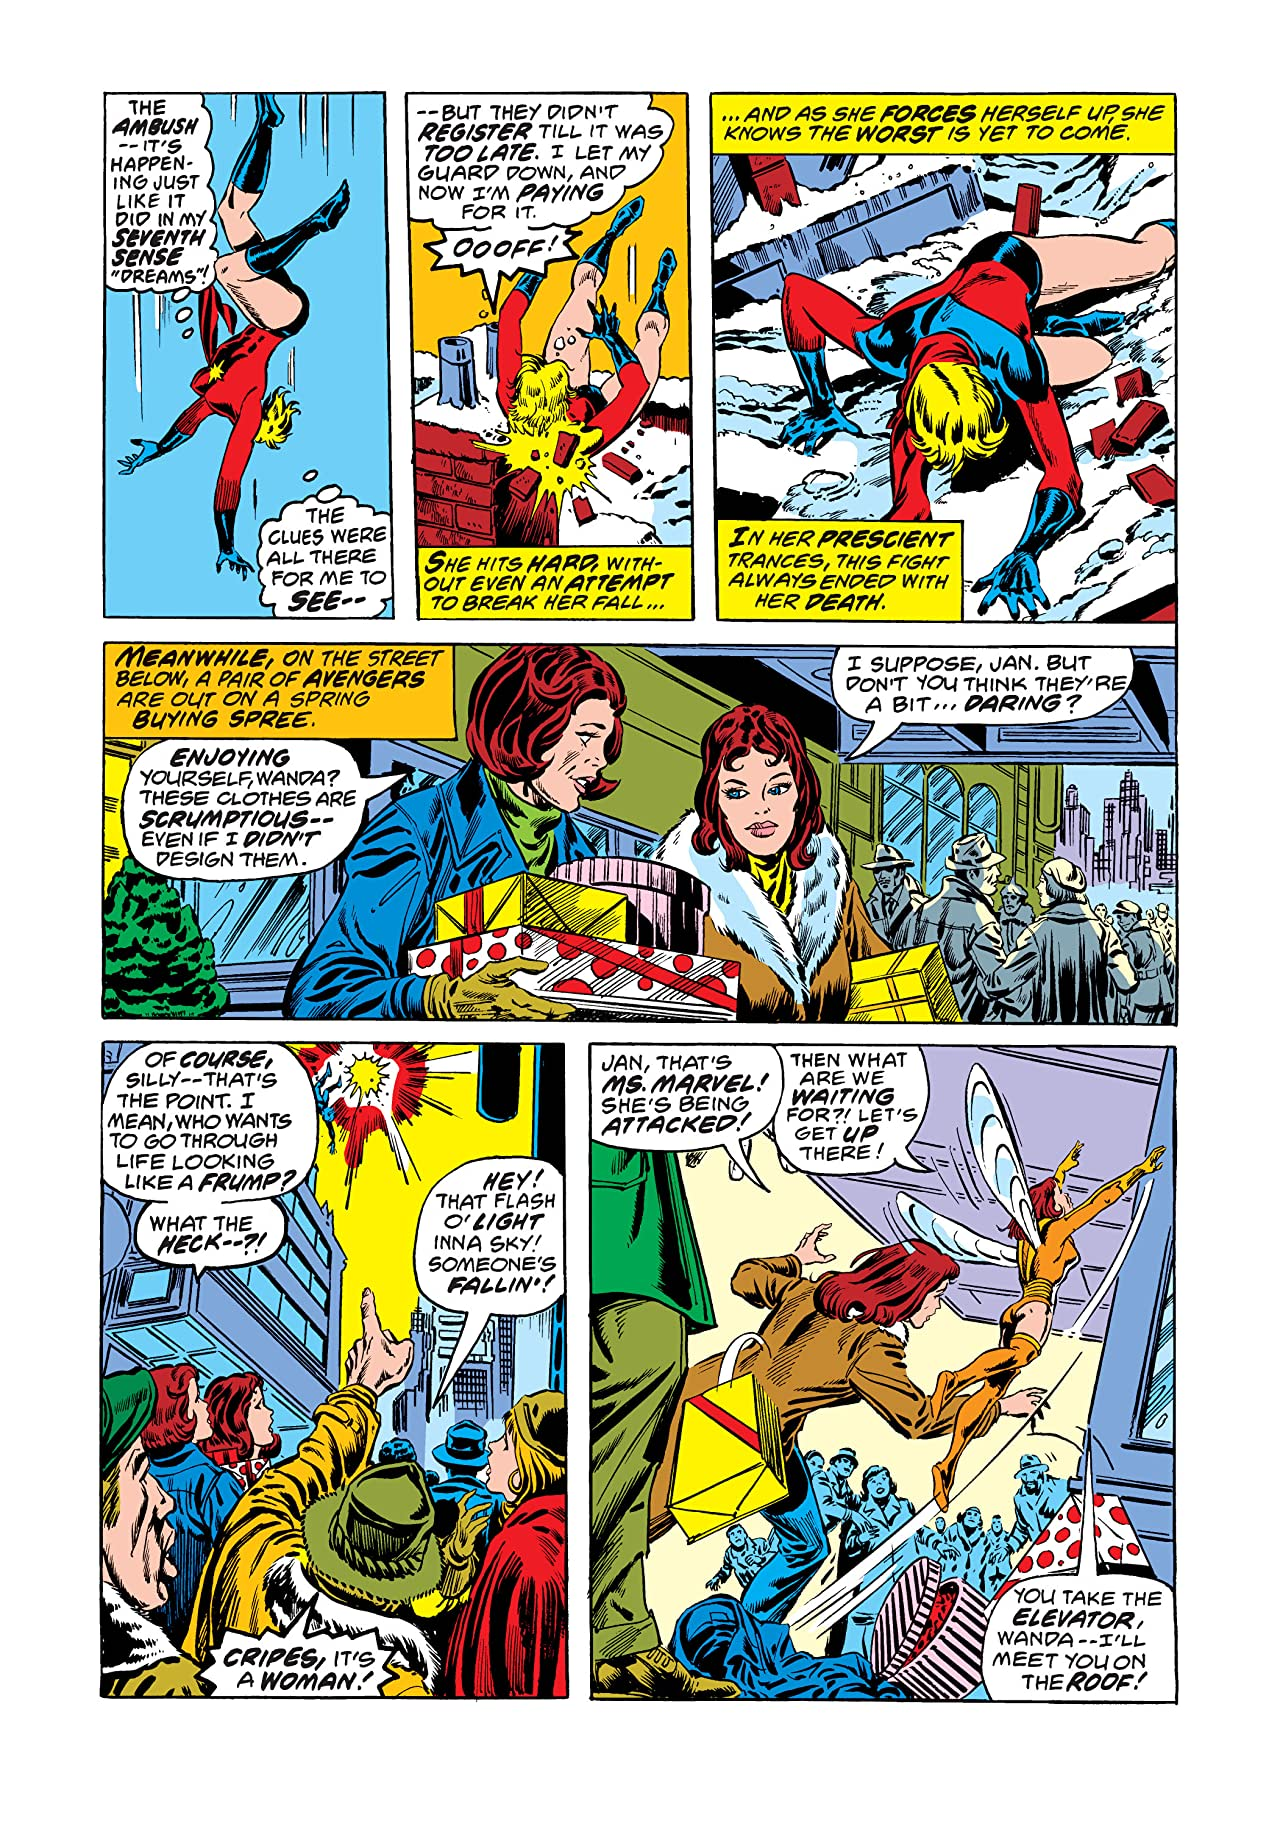 Ms. Marvel (1977-1979) #18